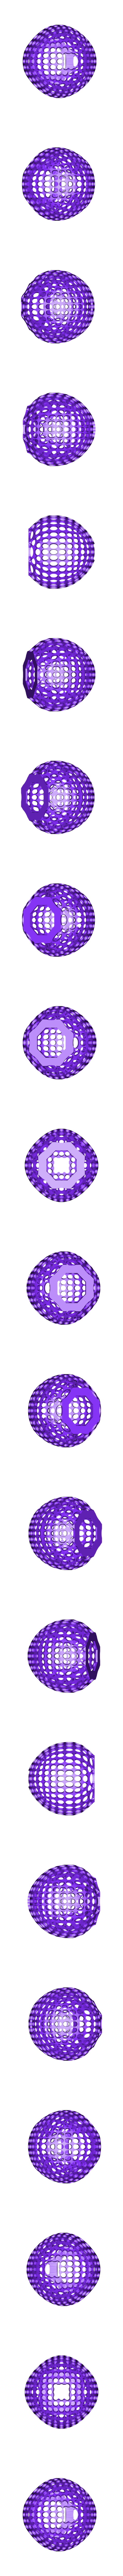 GlobeHole_2.stl Download free STL file Decorative globe • 3D printable model, phipo333